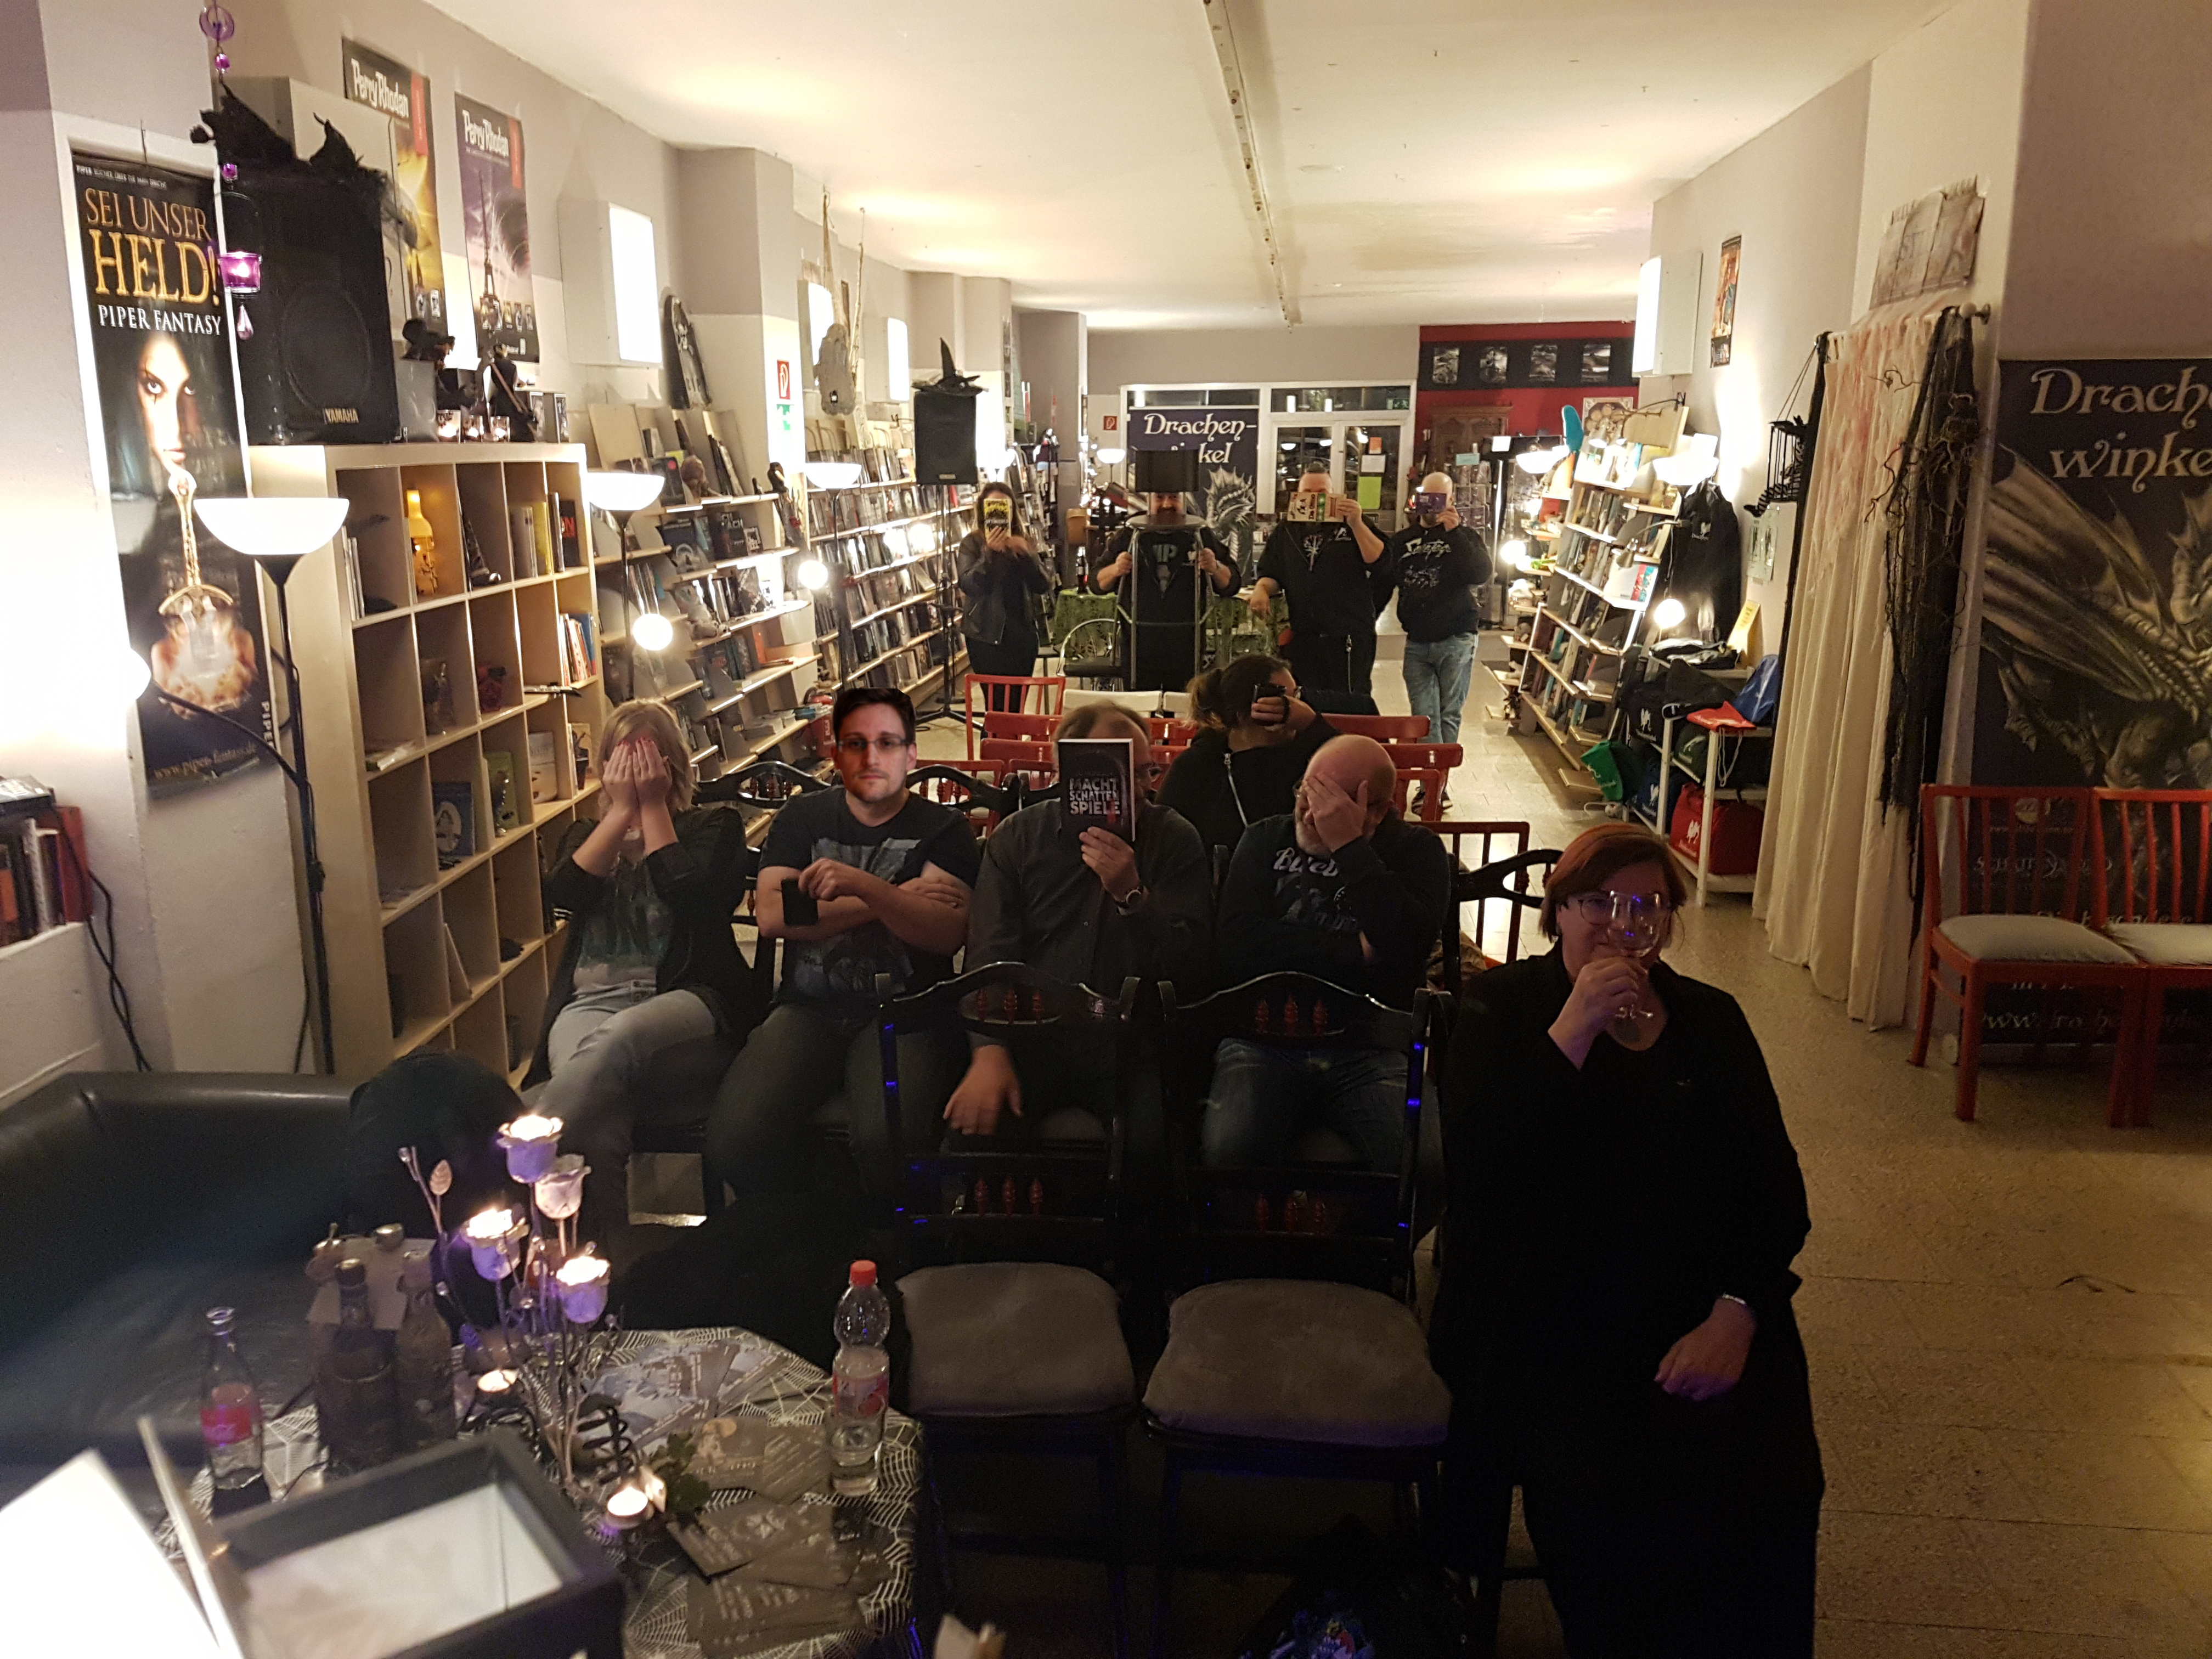 Lesung im Drachenwinkel in Dillingen